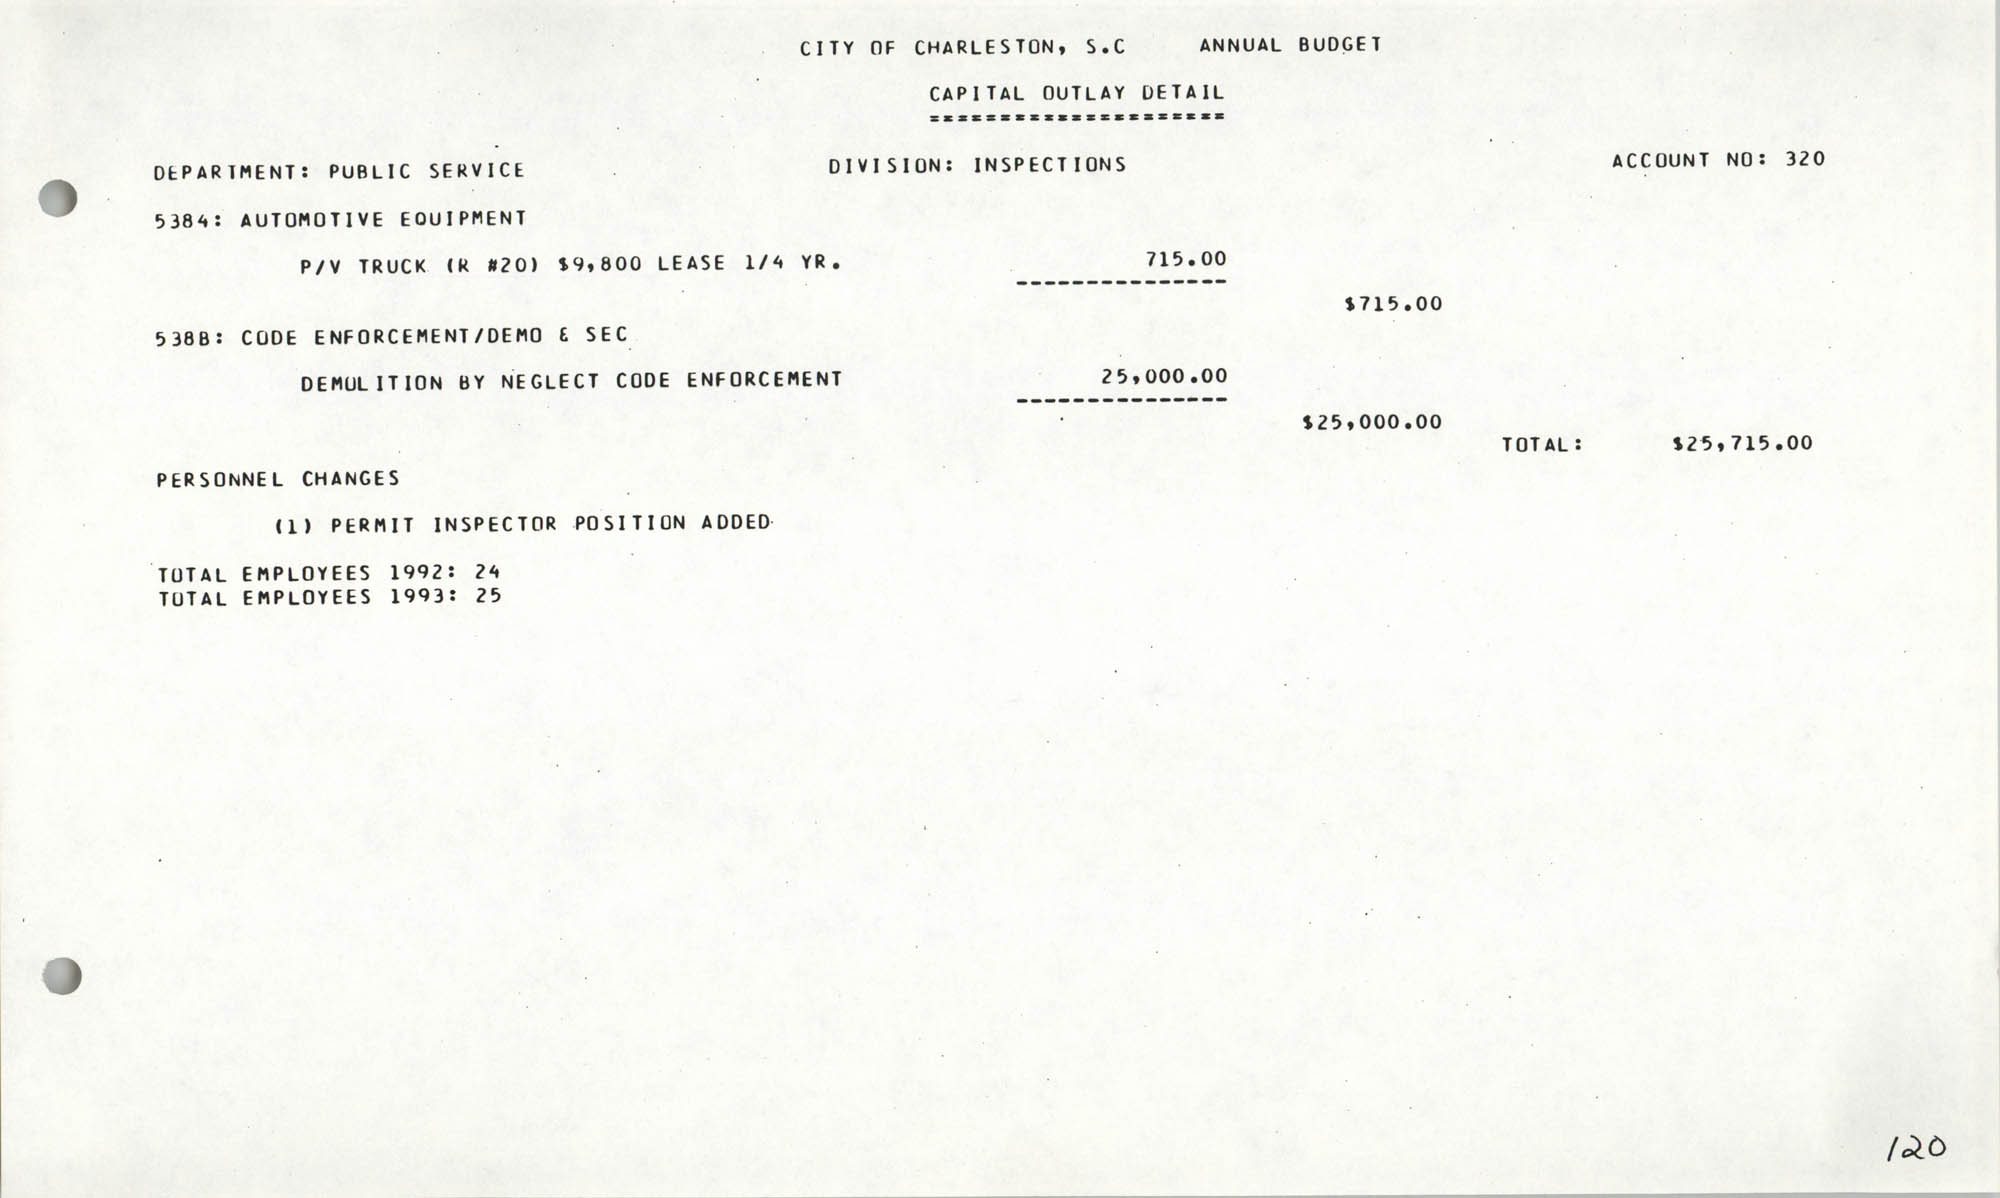 The City Council of Charleston, South Carolina, 1993 Budget, Page 120